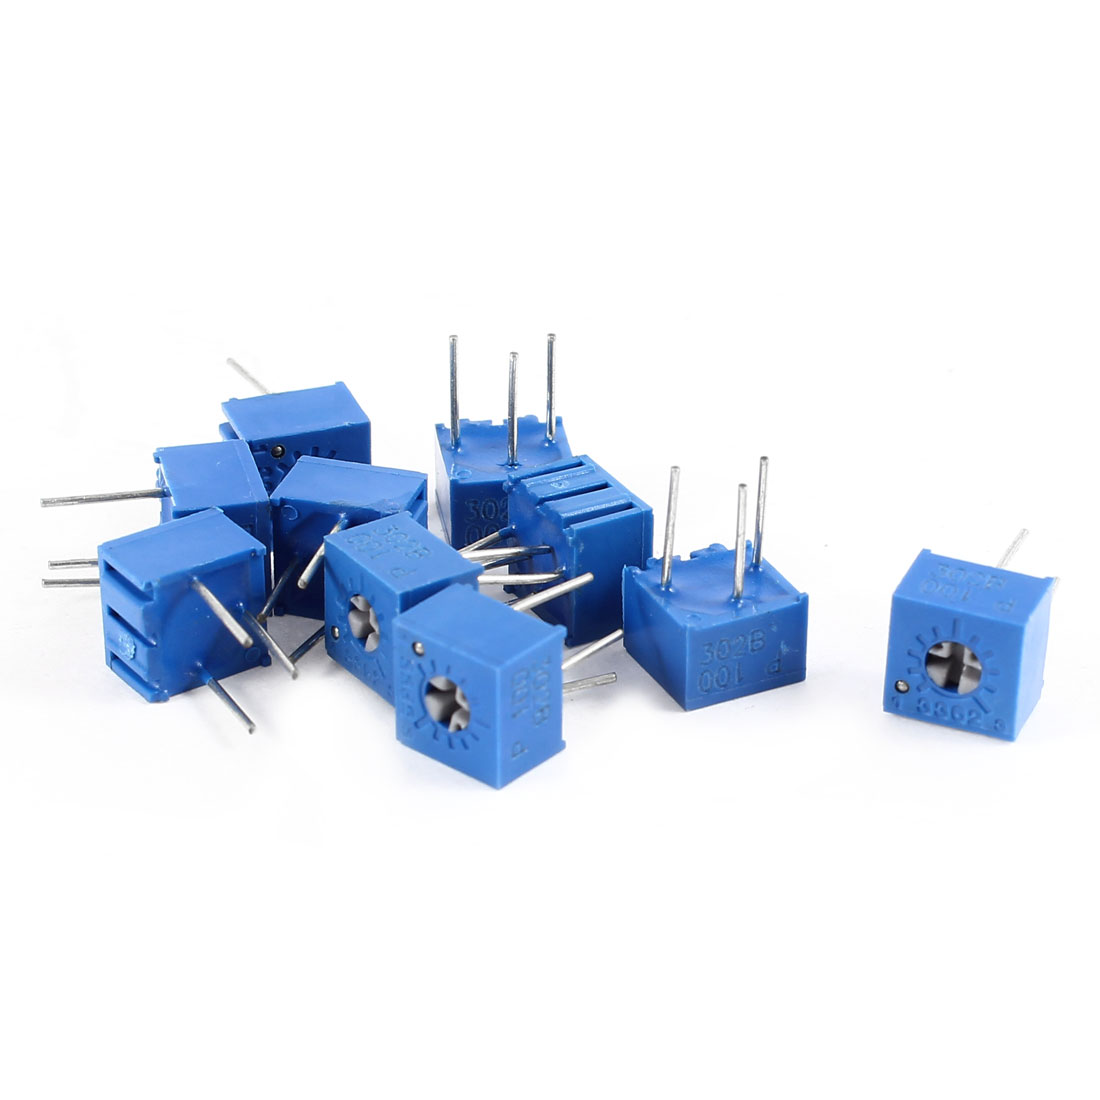 10Pcs 3362W-100 10 ohm 3 Pins High Precision Adjustable Resistor Trim Pot Potentiometer Trimmer